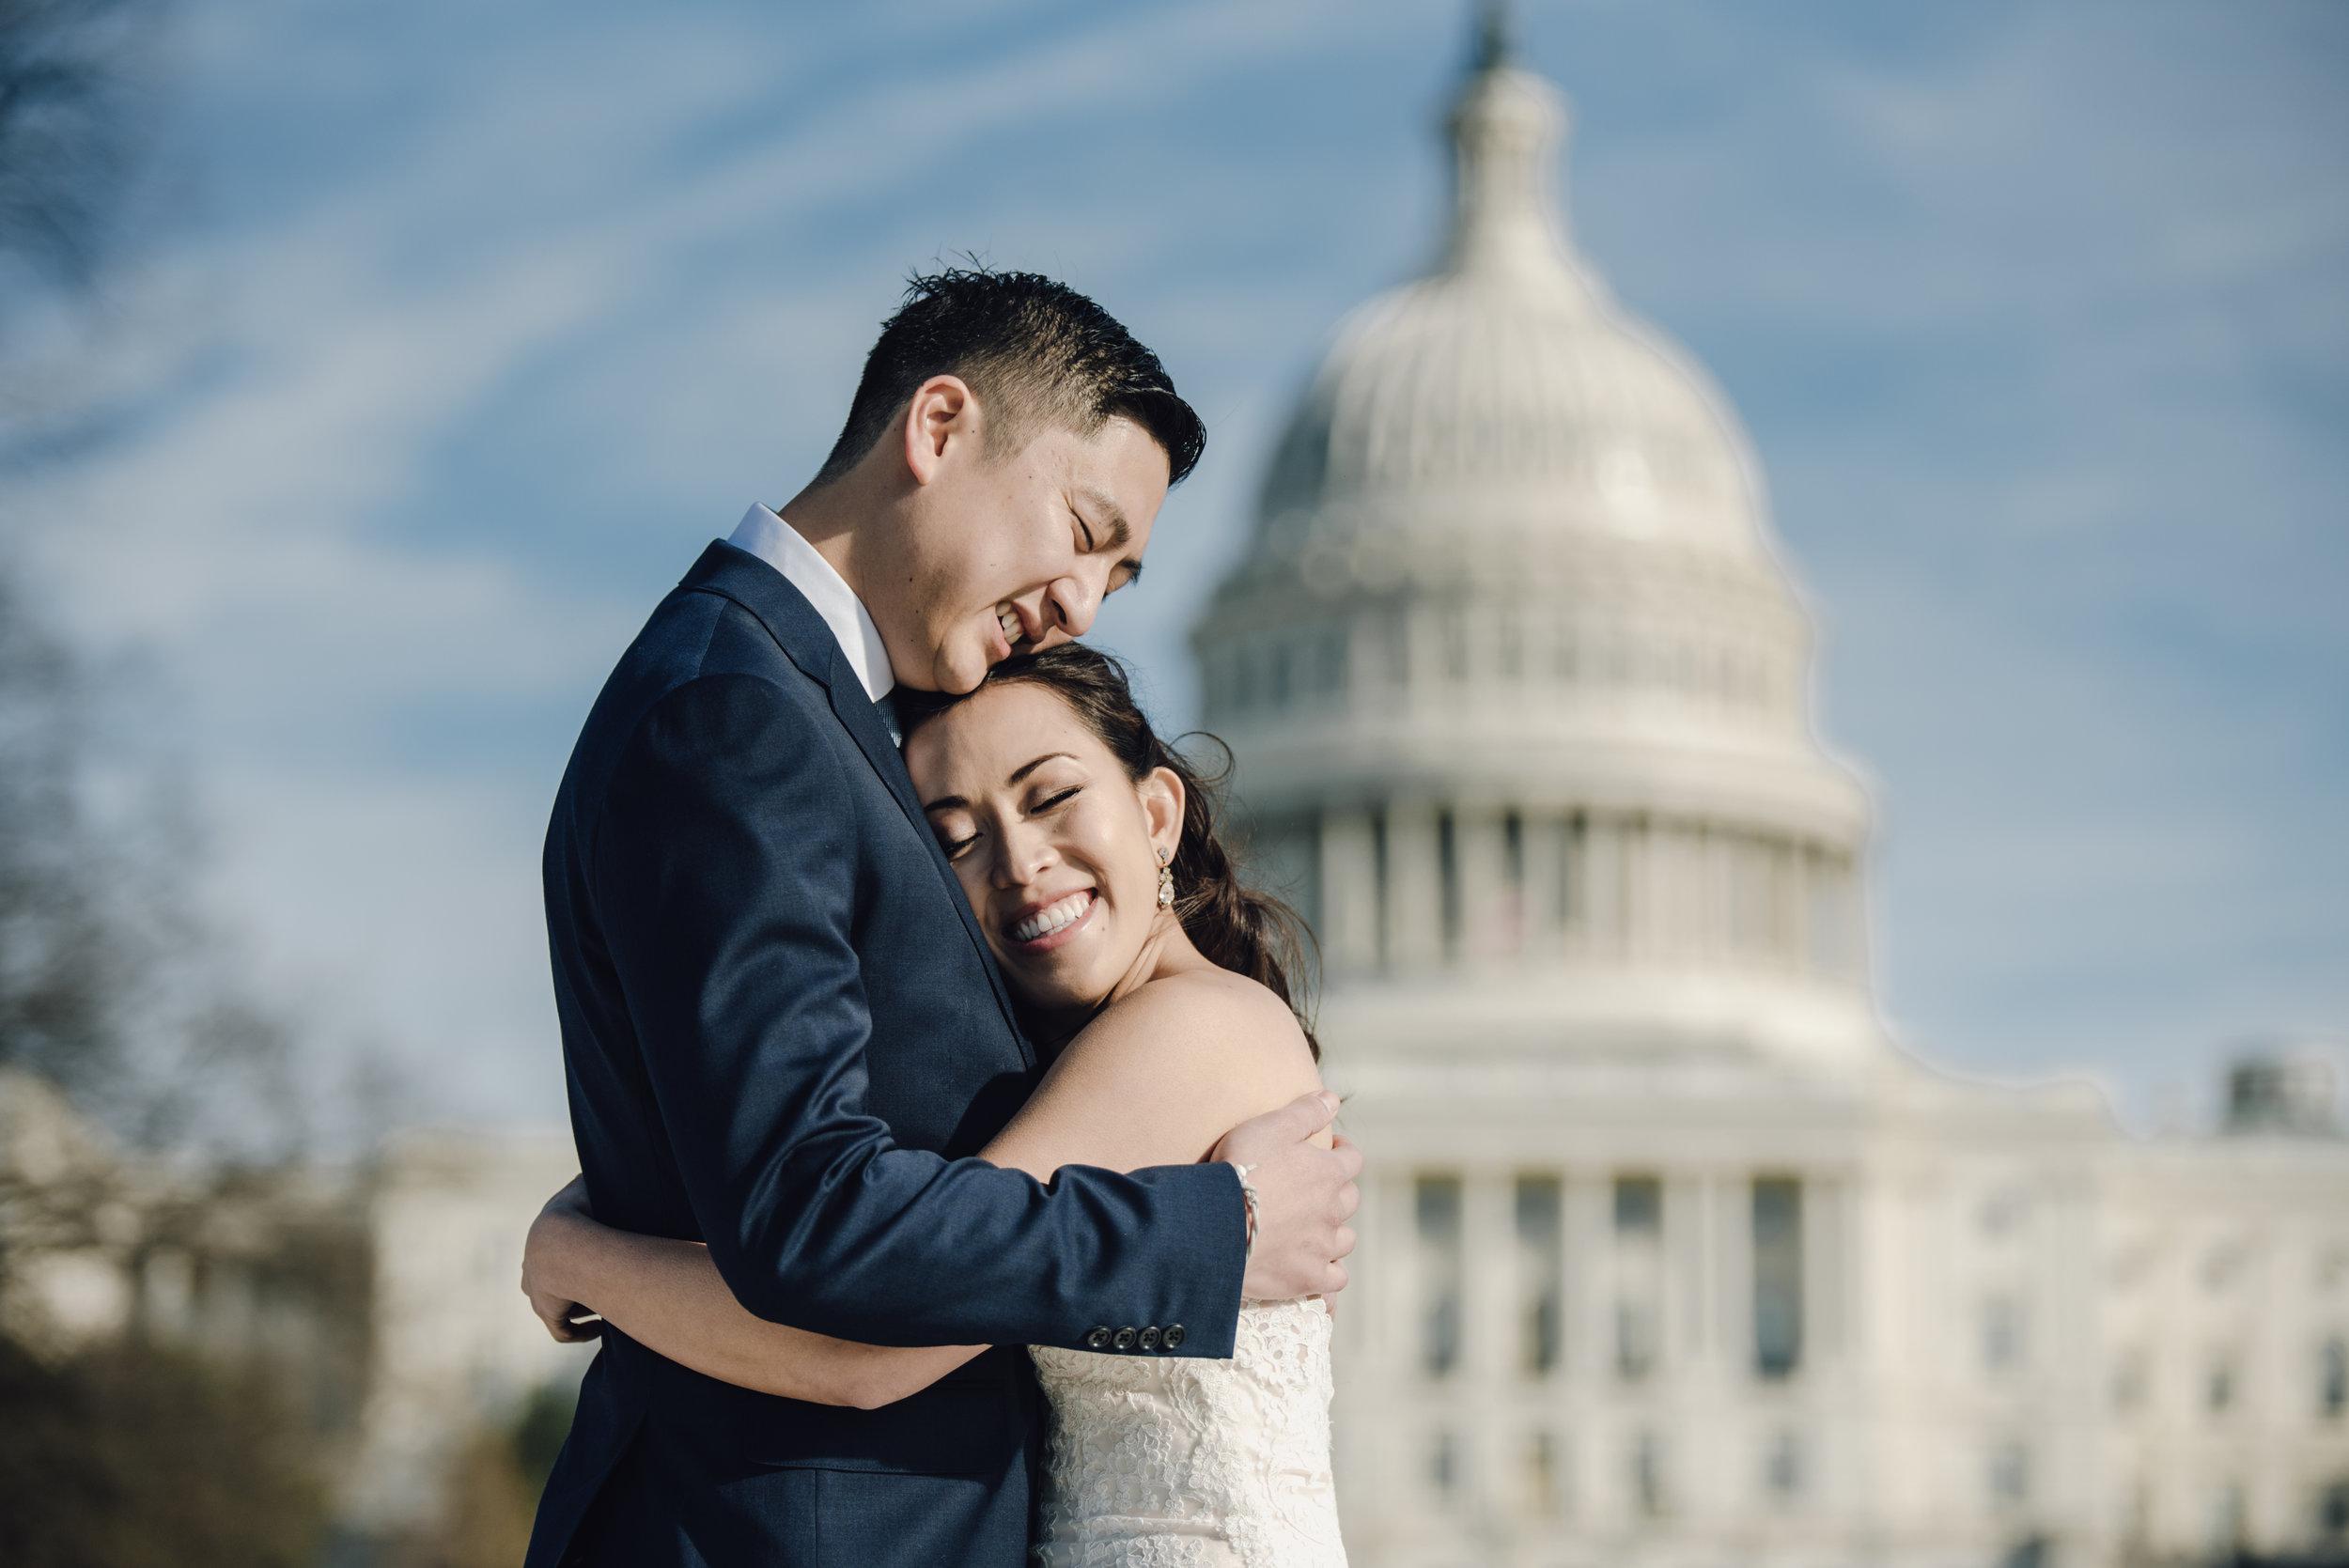 Main and Simple Photography_2018_Weddings_DC_K+T-603.jpg